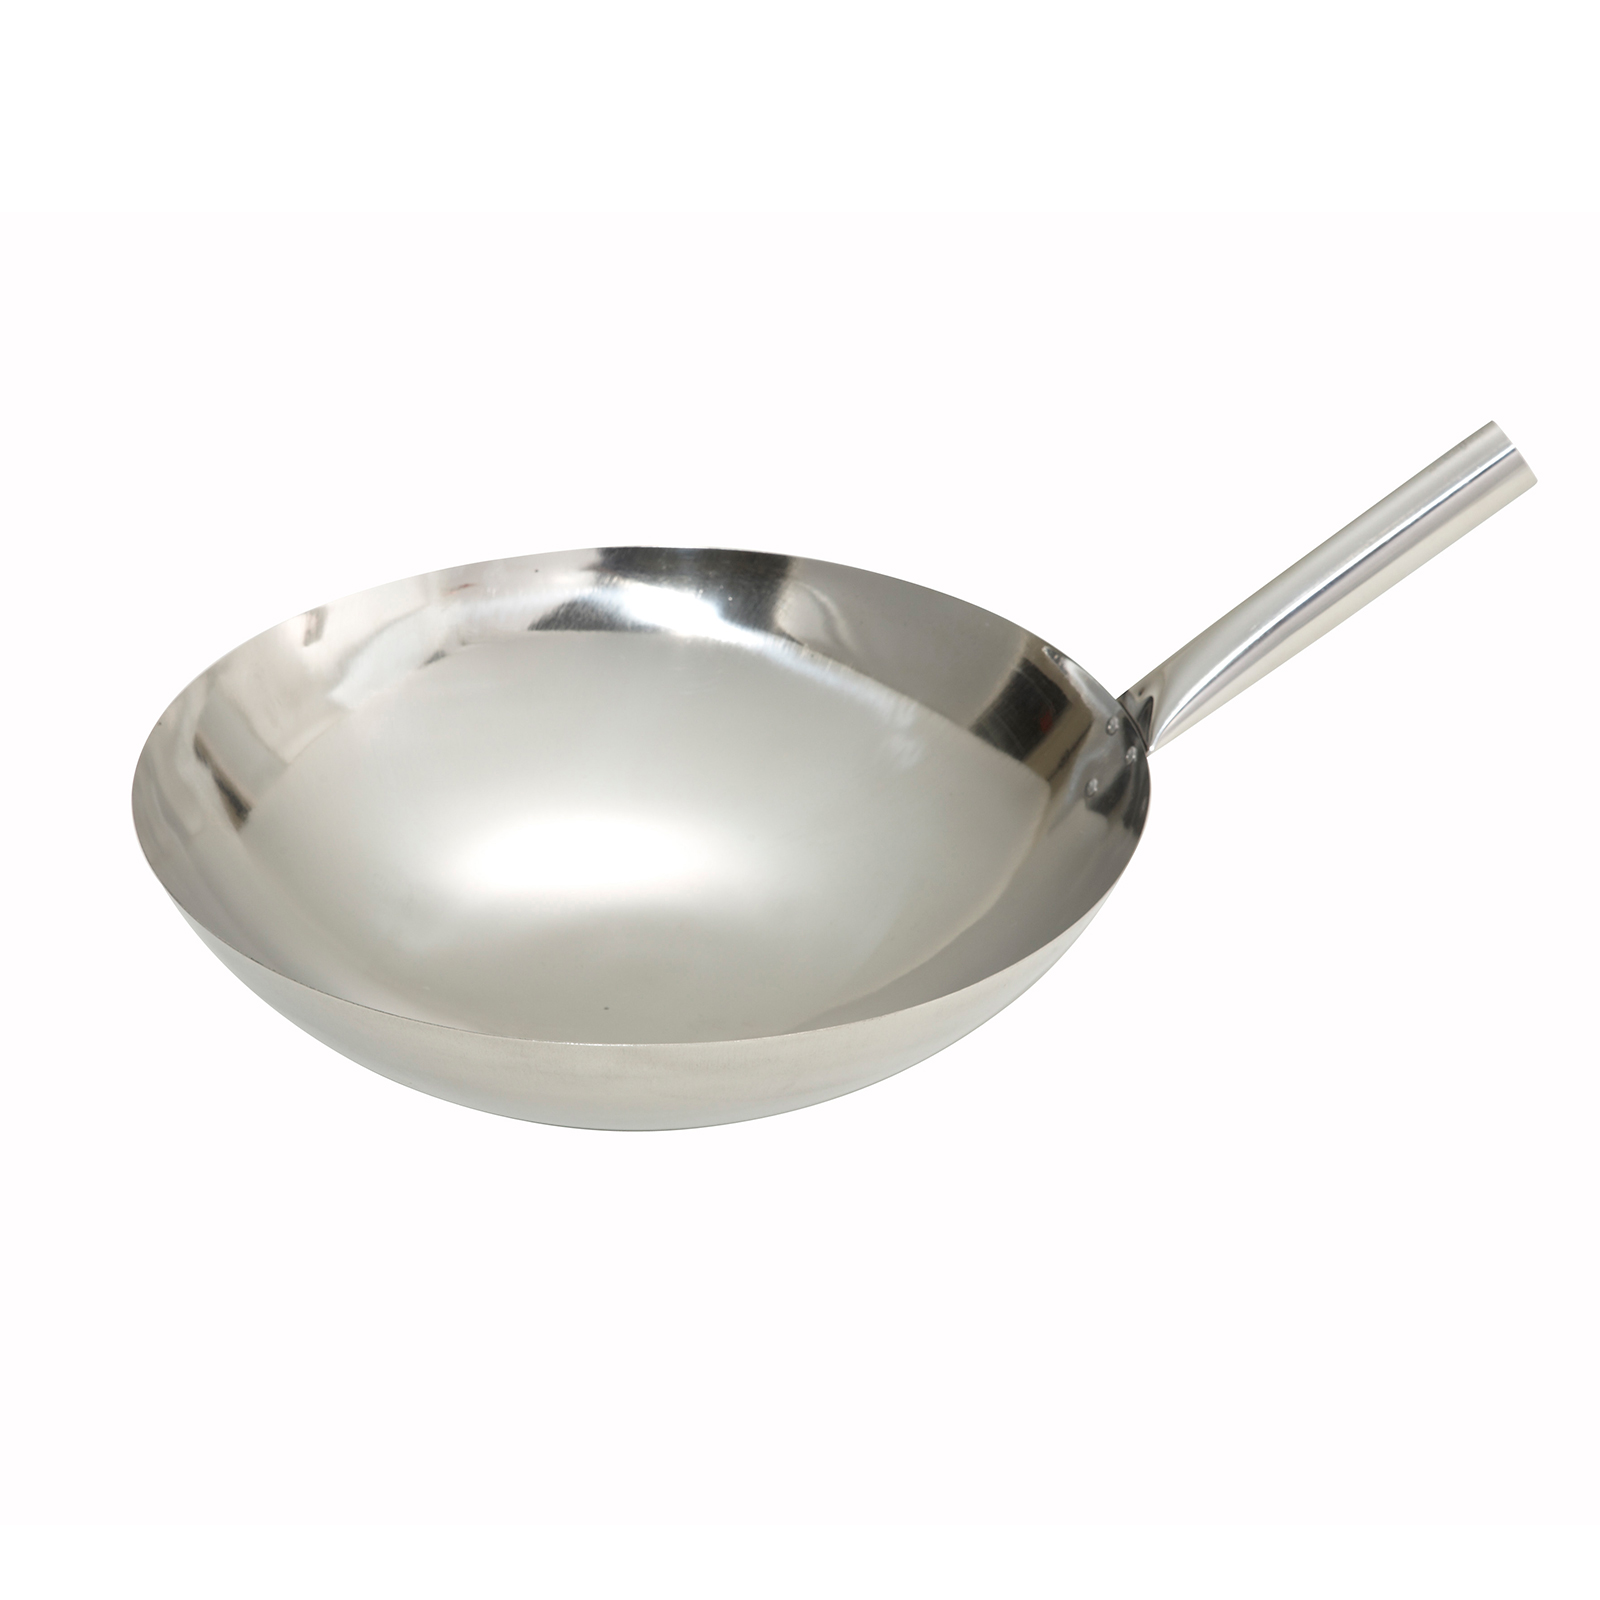 Winco WOK-16N wok pan